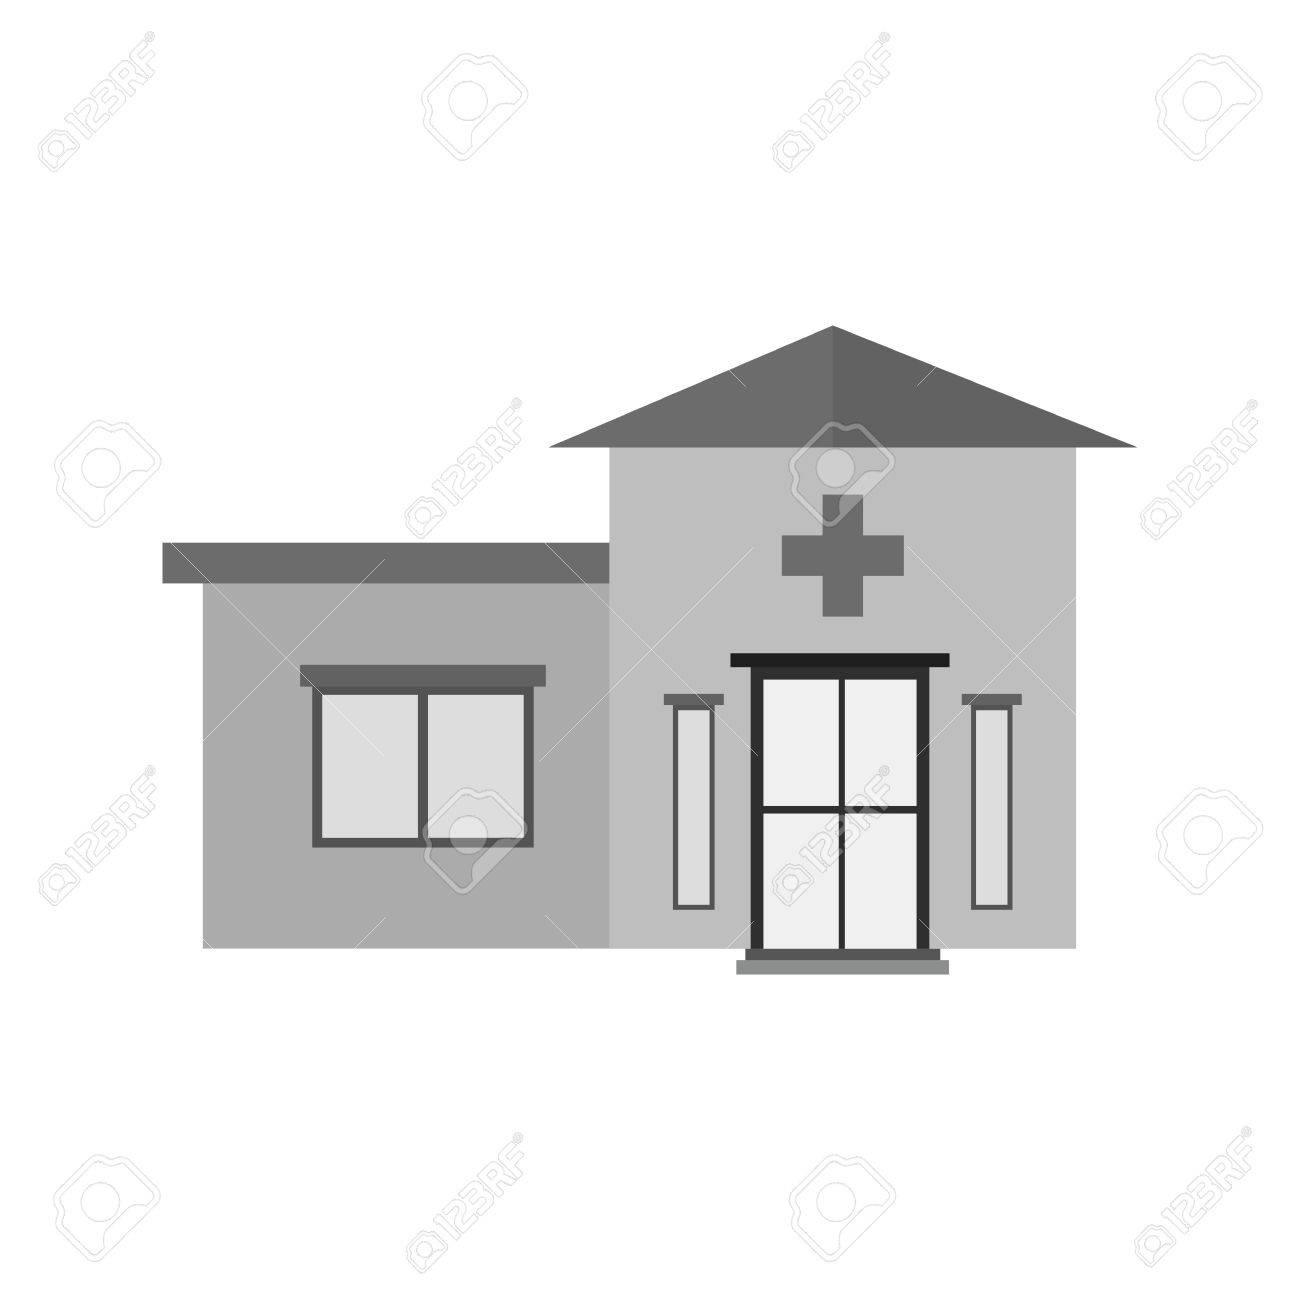 Sanitäter symbol  Erste Hilfe, Sanitäter, Sanitäter-Symbol Vektor-Bild. Kann Auch ...